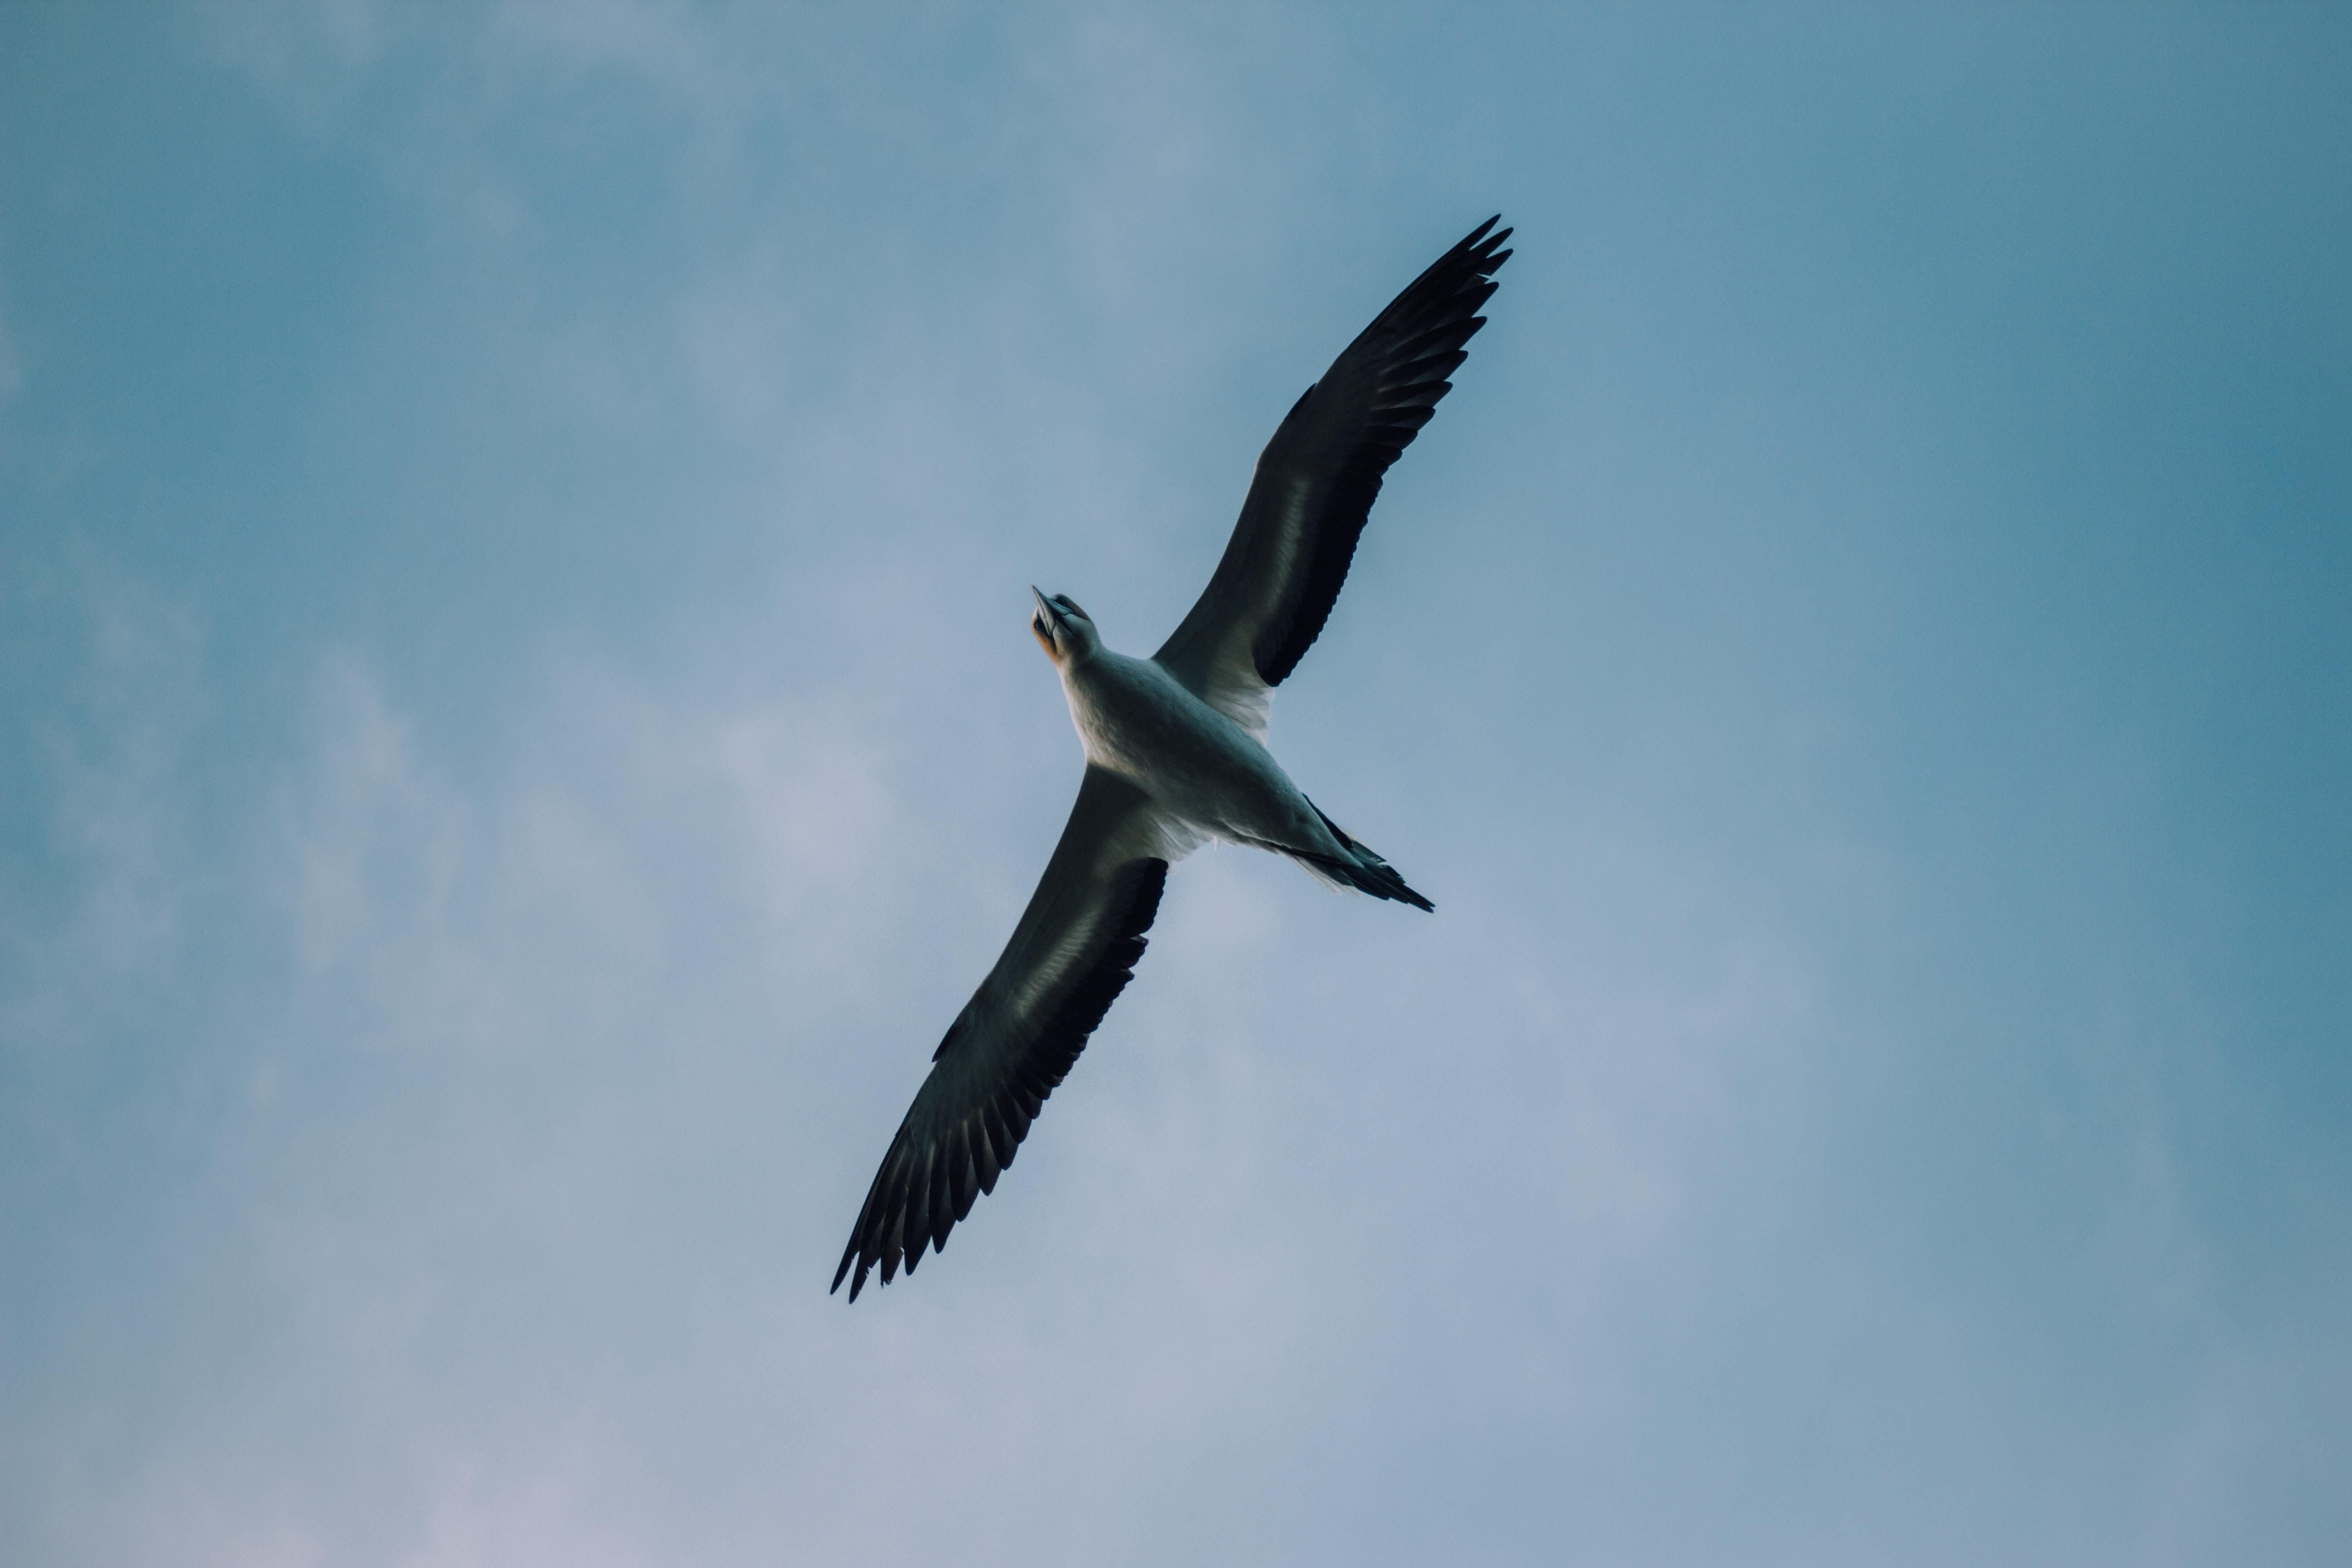 gray bird during daytime